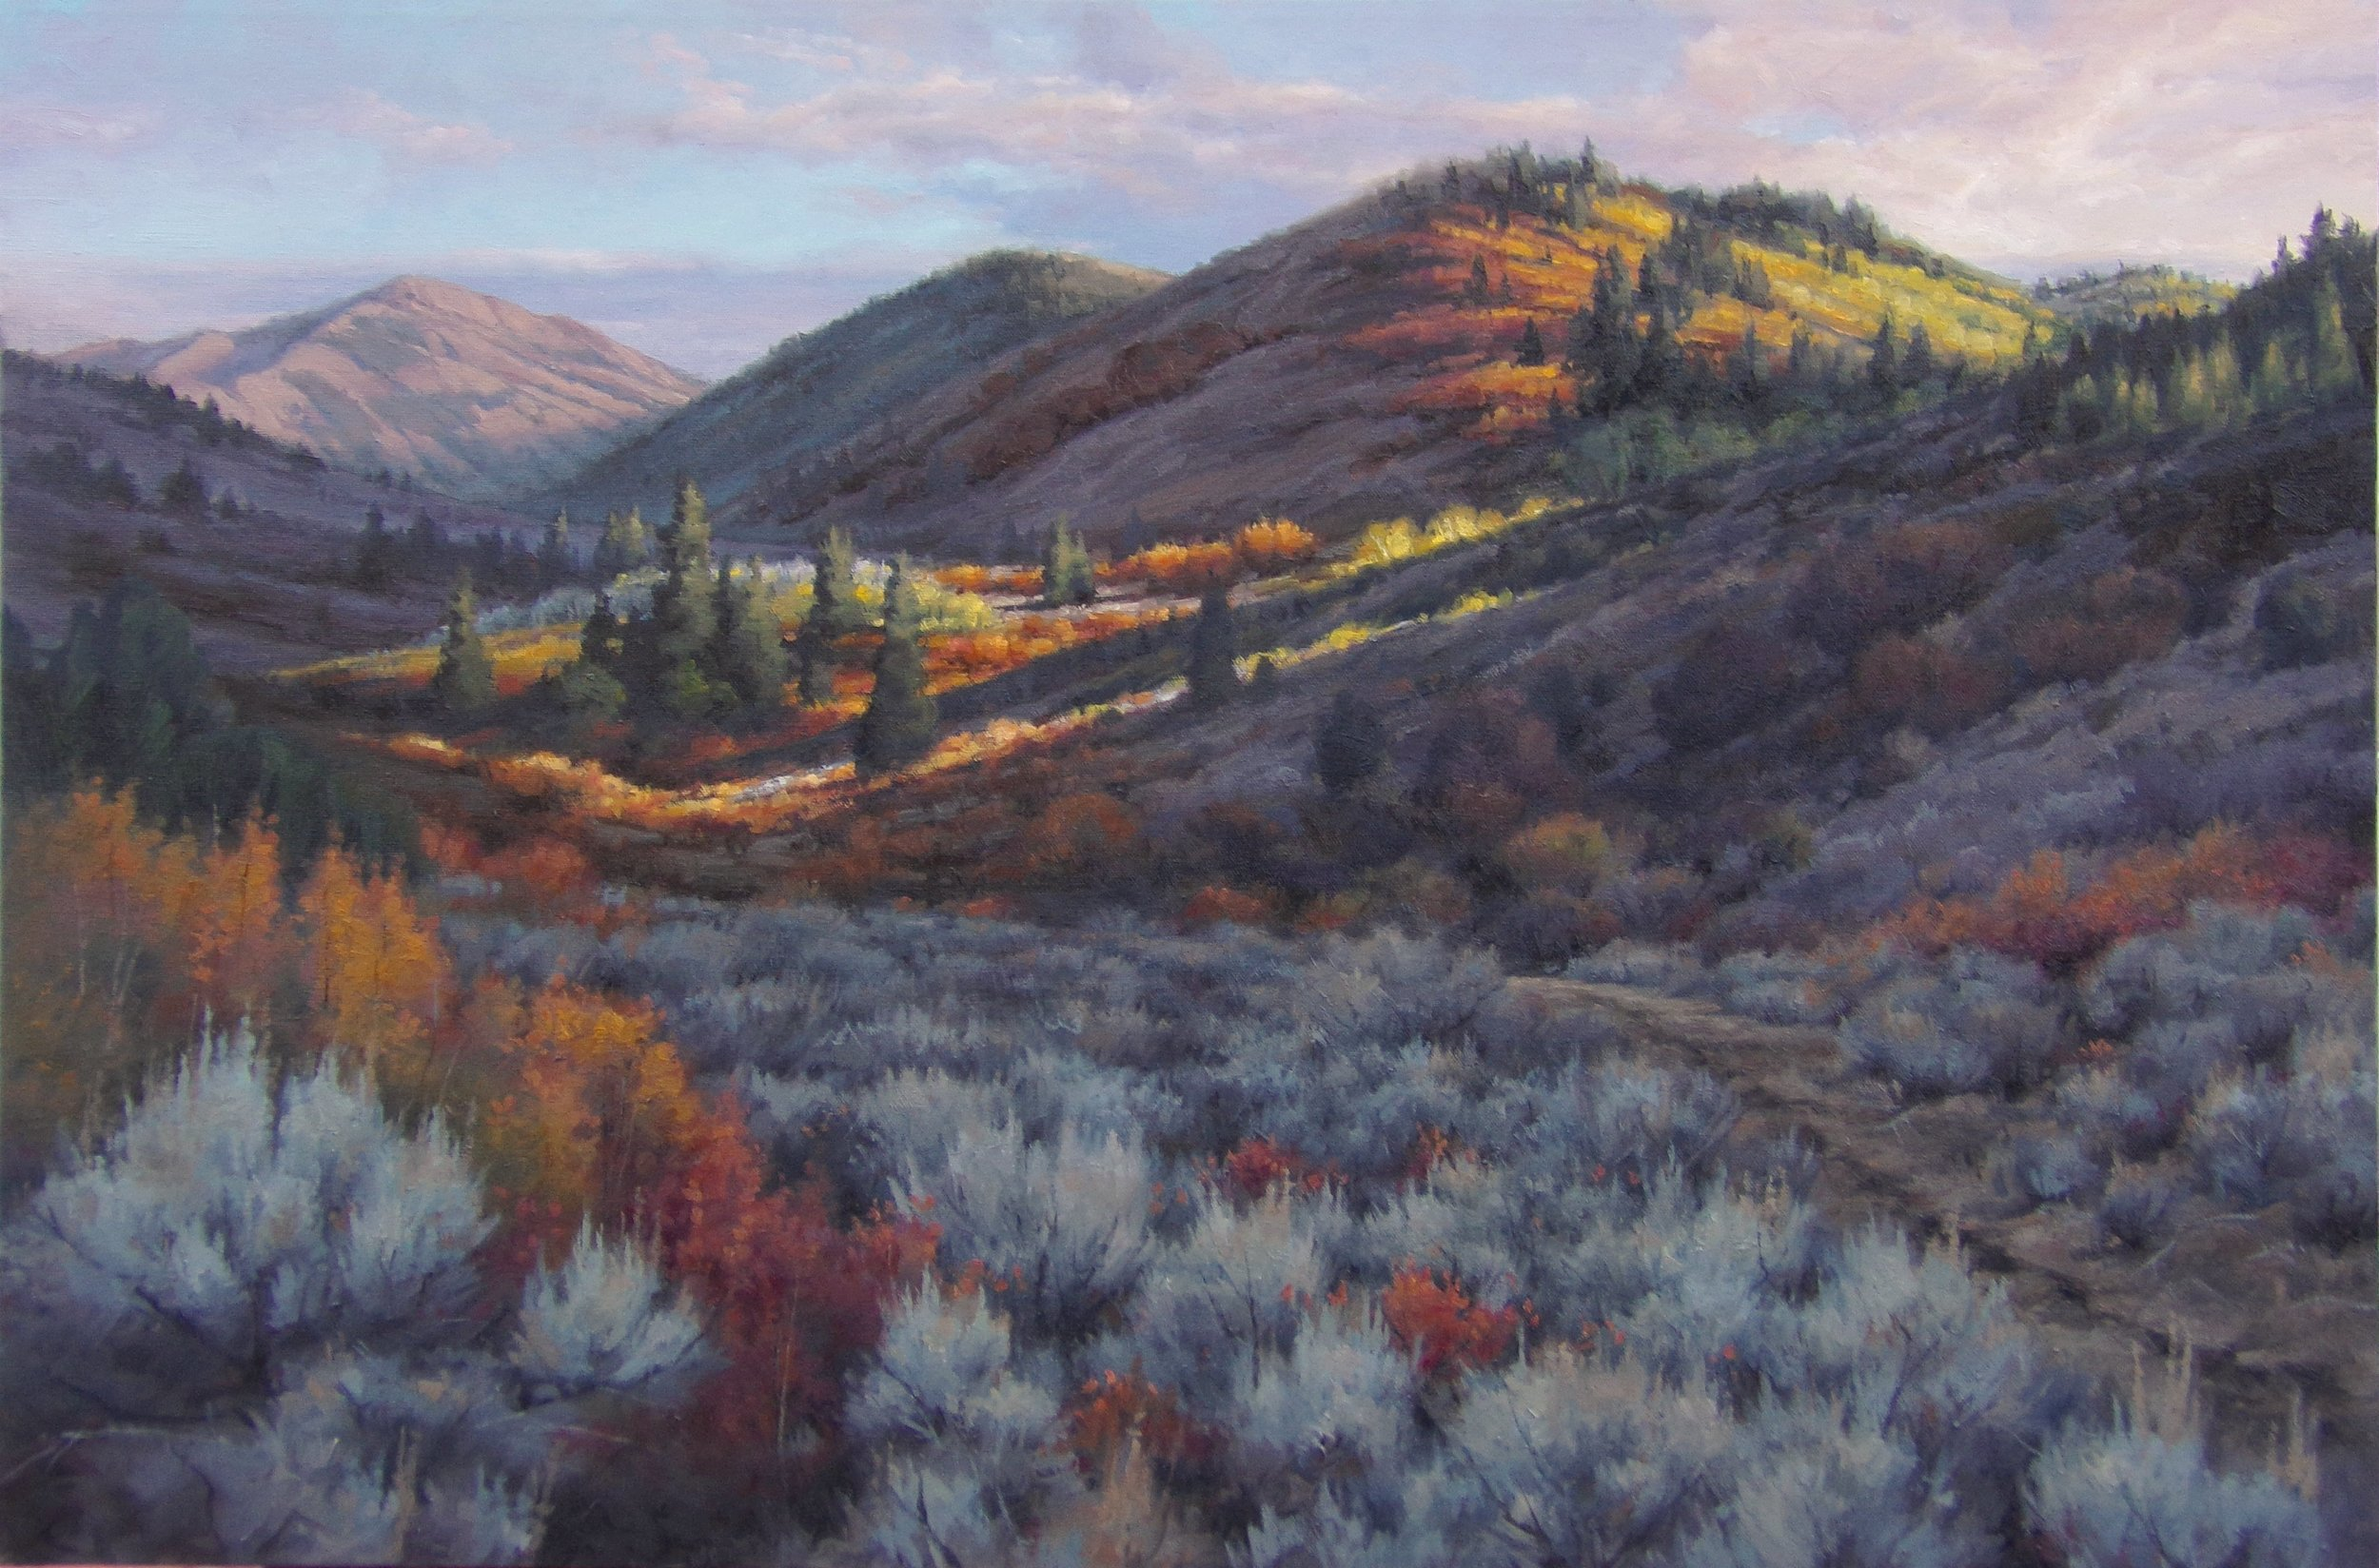 """East Fork Trail"" - 24x36"" oil"